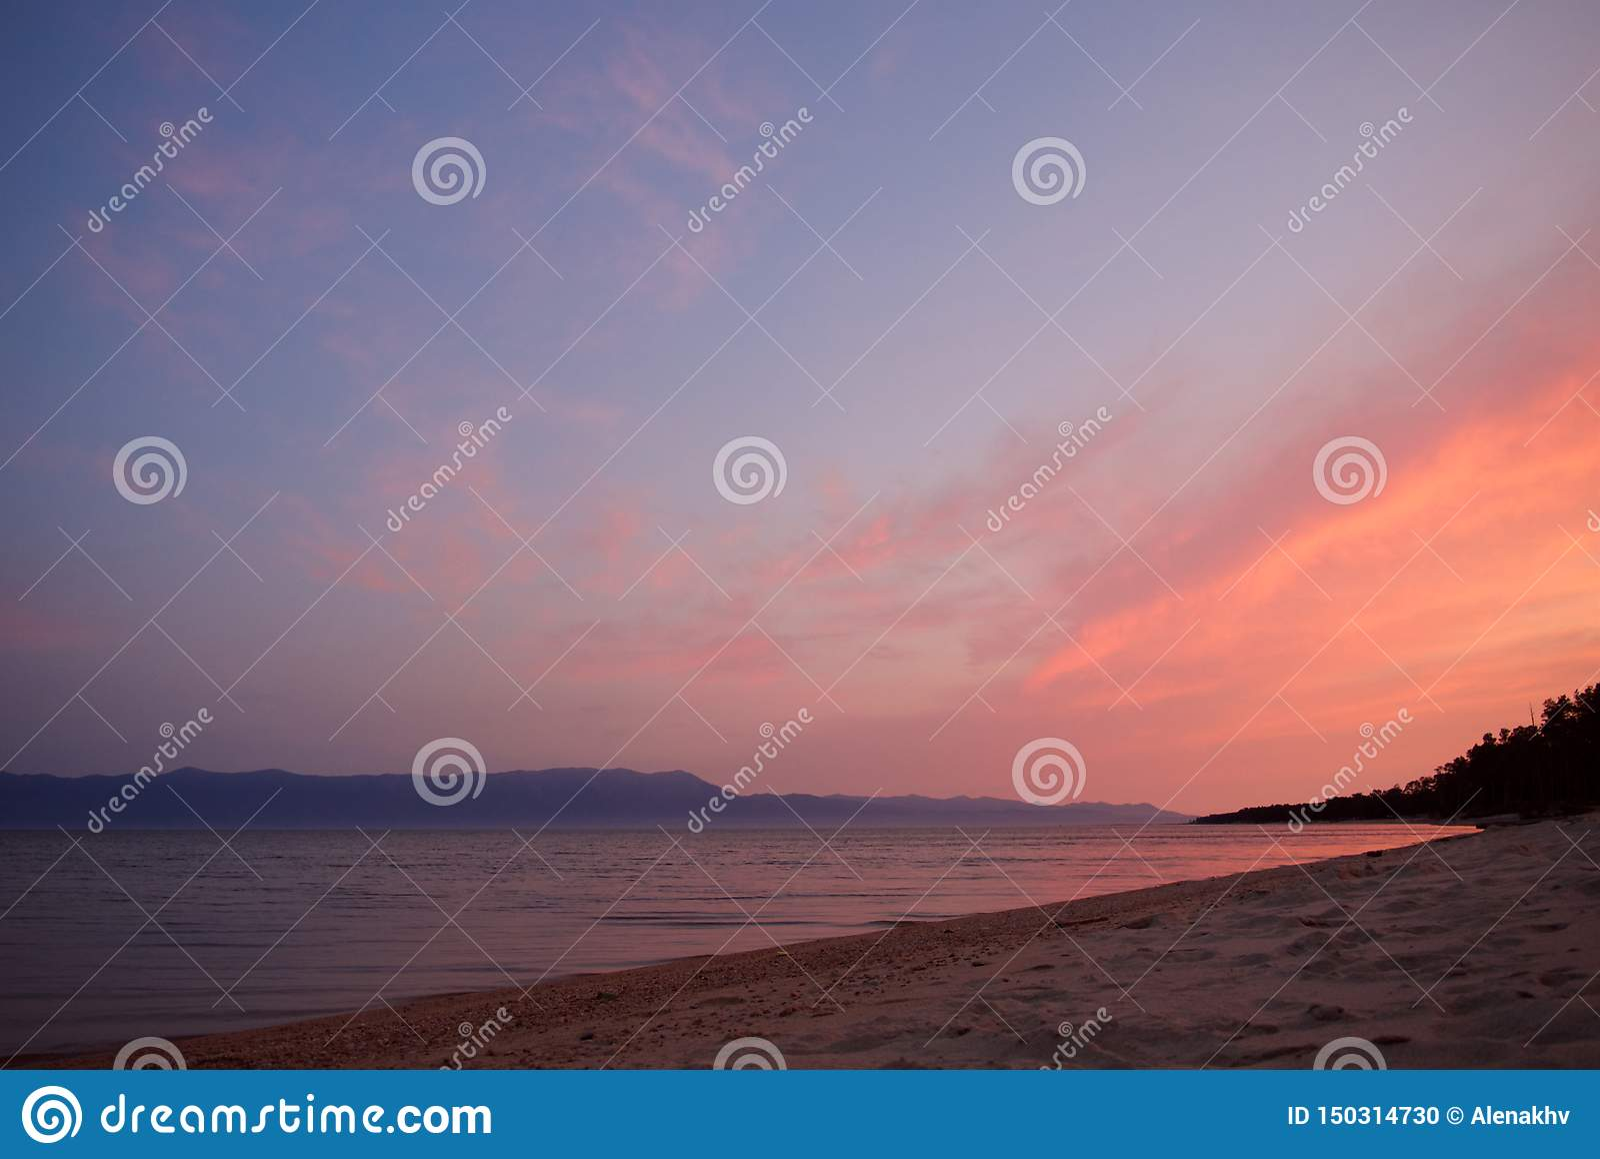 Purpere en roze zonsopgang over het meer van Baikal